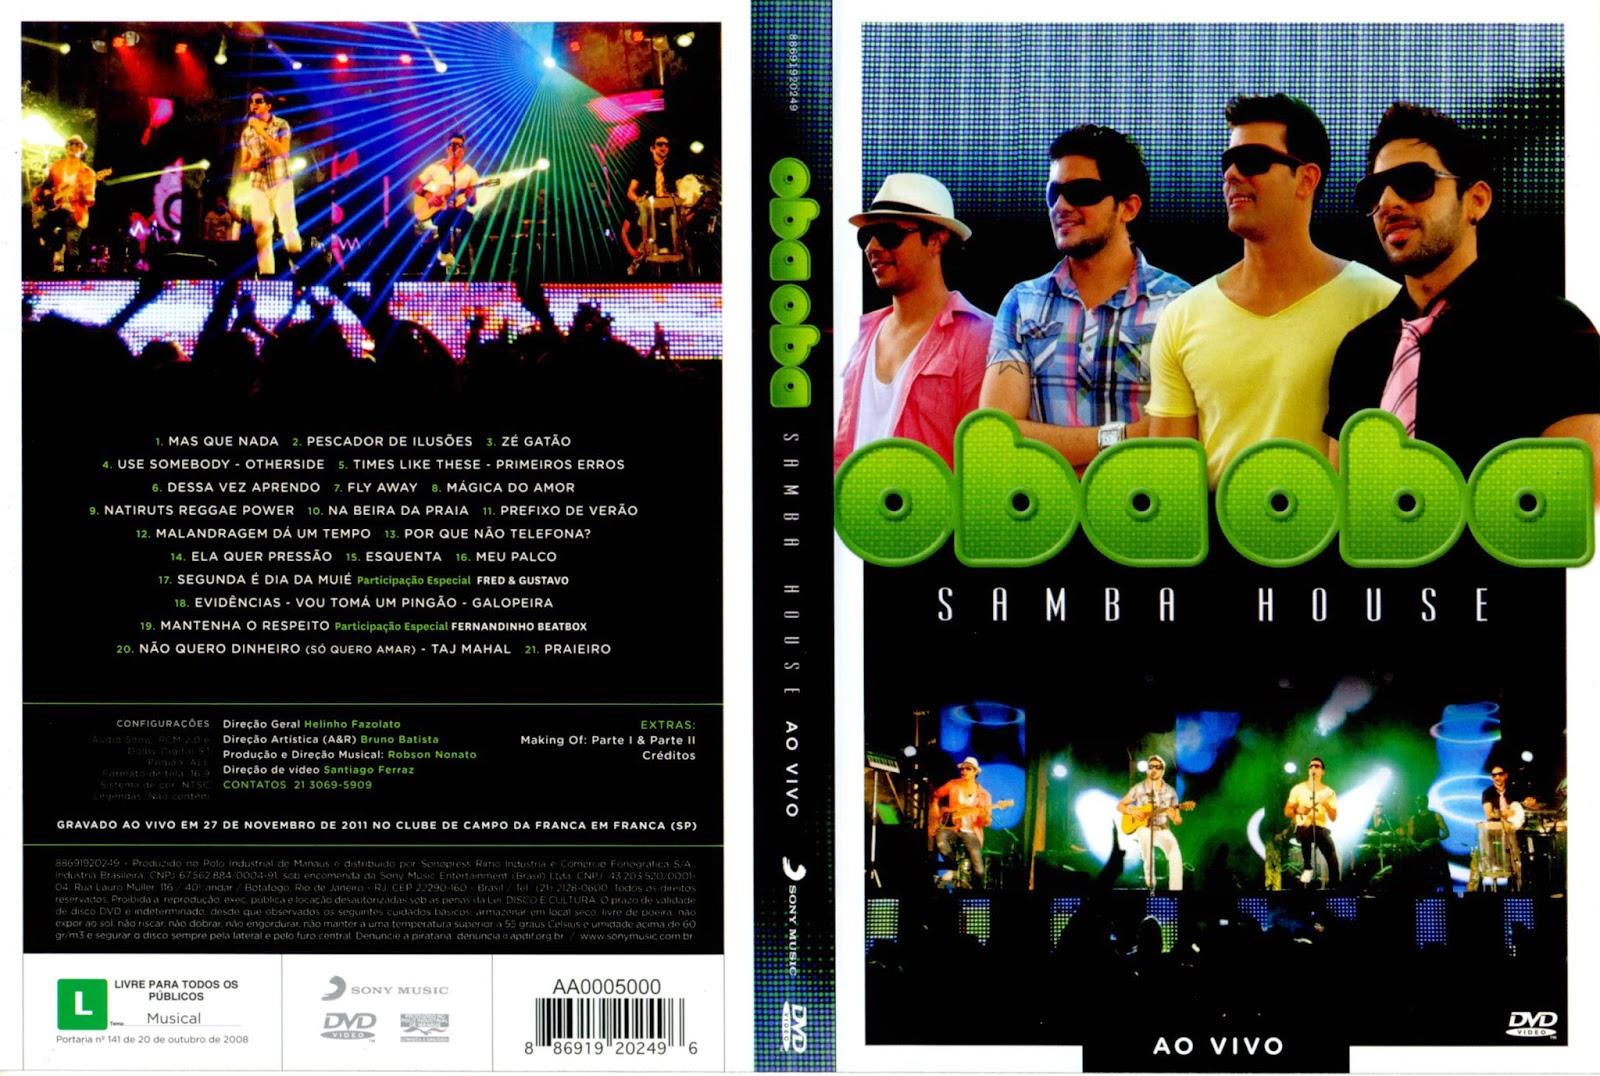 Oba Oba Samba House Ao Vivo No Rio DVD-R